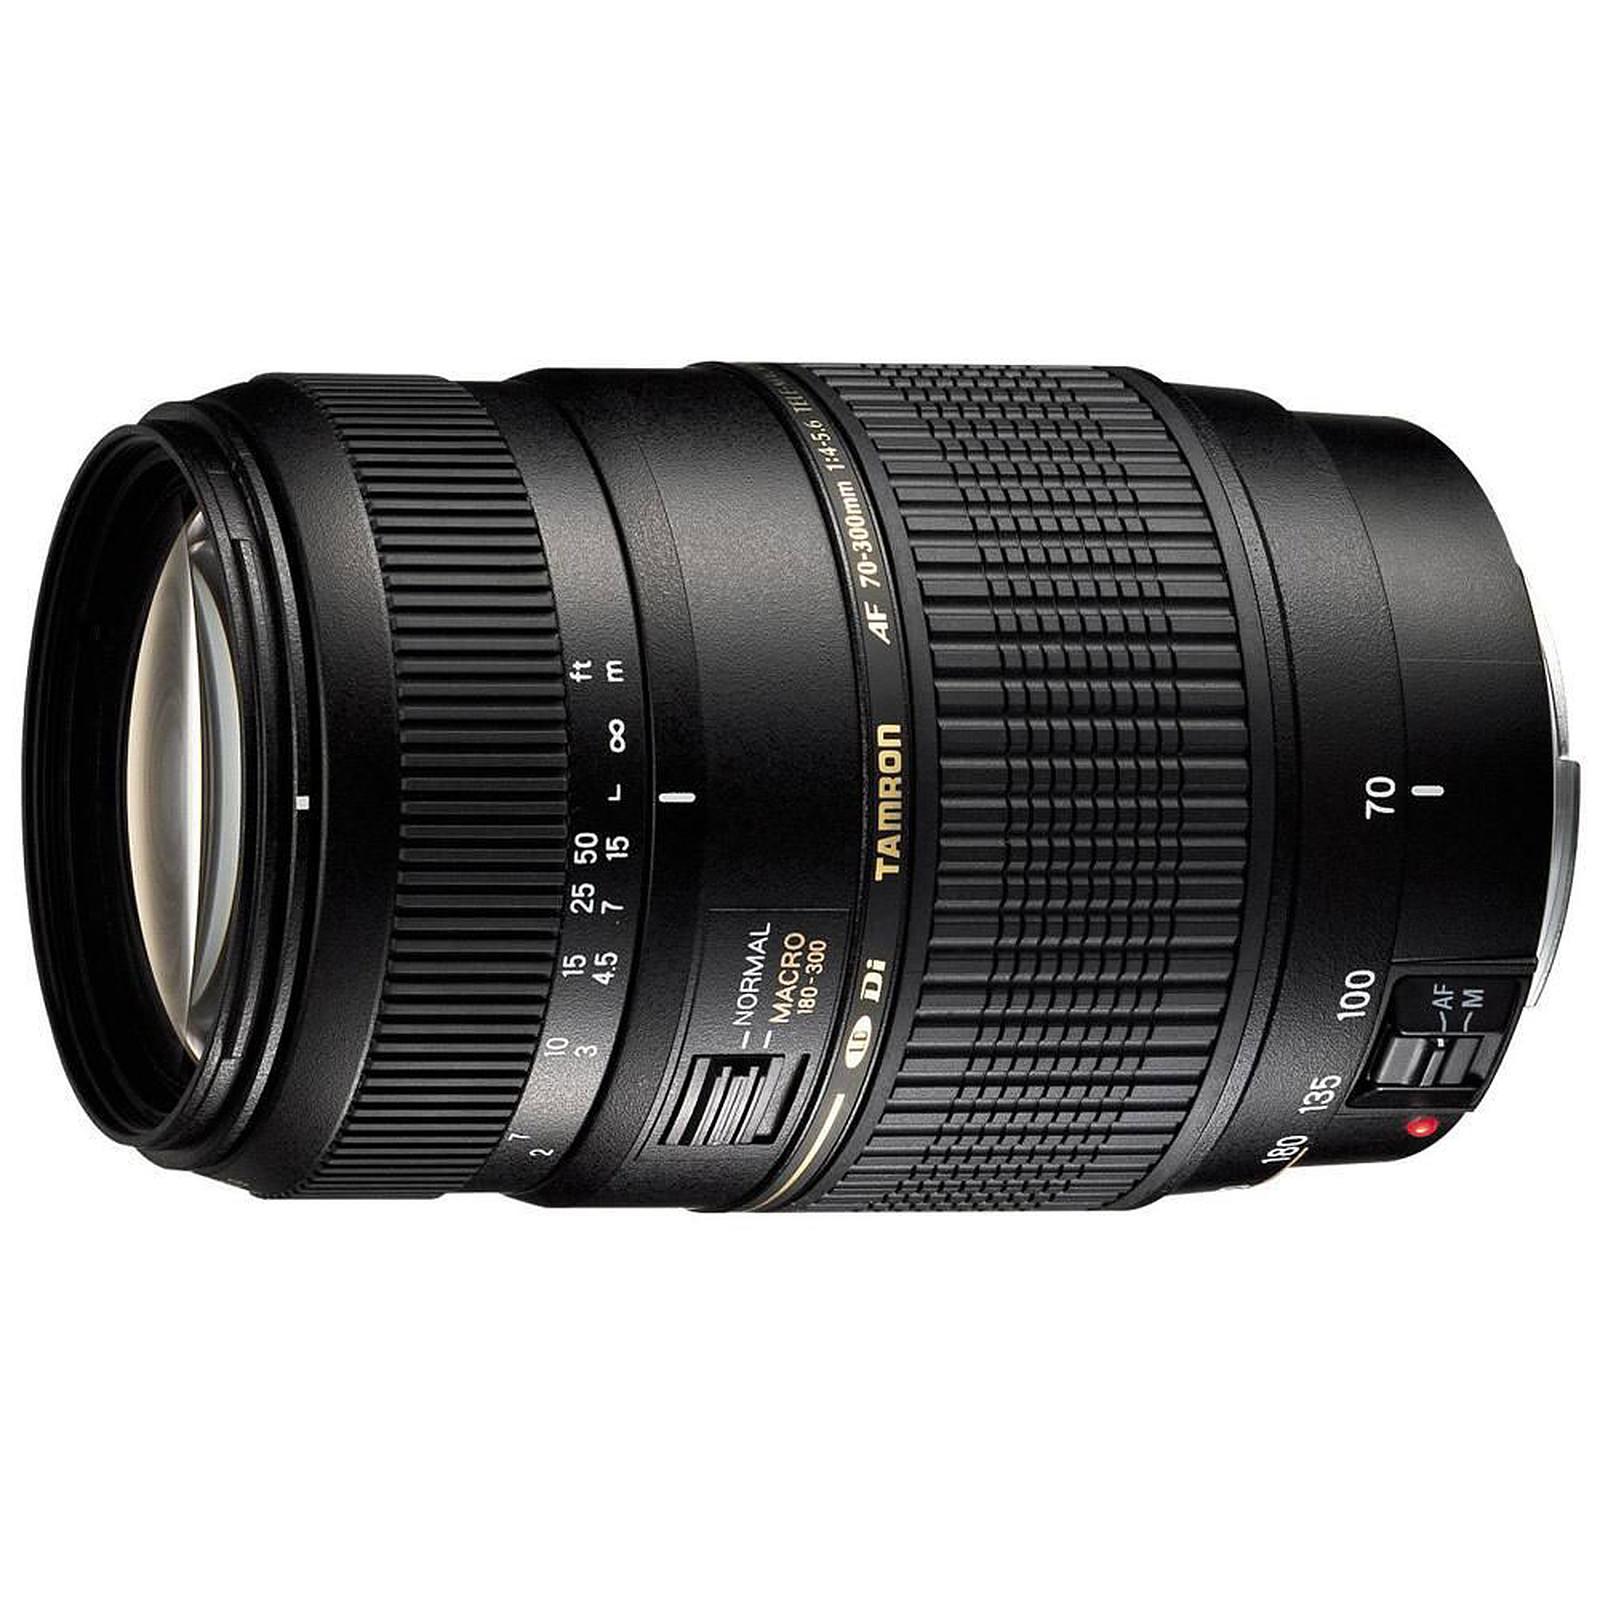 Tamron AF 70-300mm F/4-5,6 Di LD MACRO 1:2 monture Nikon